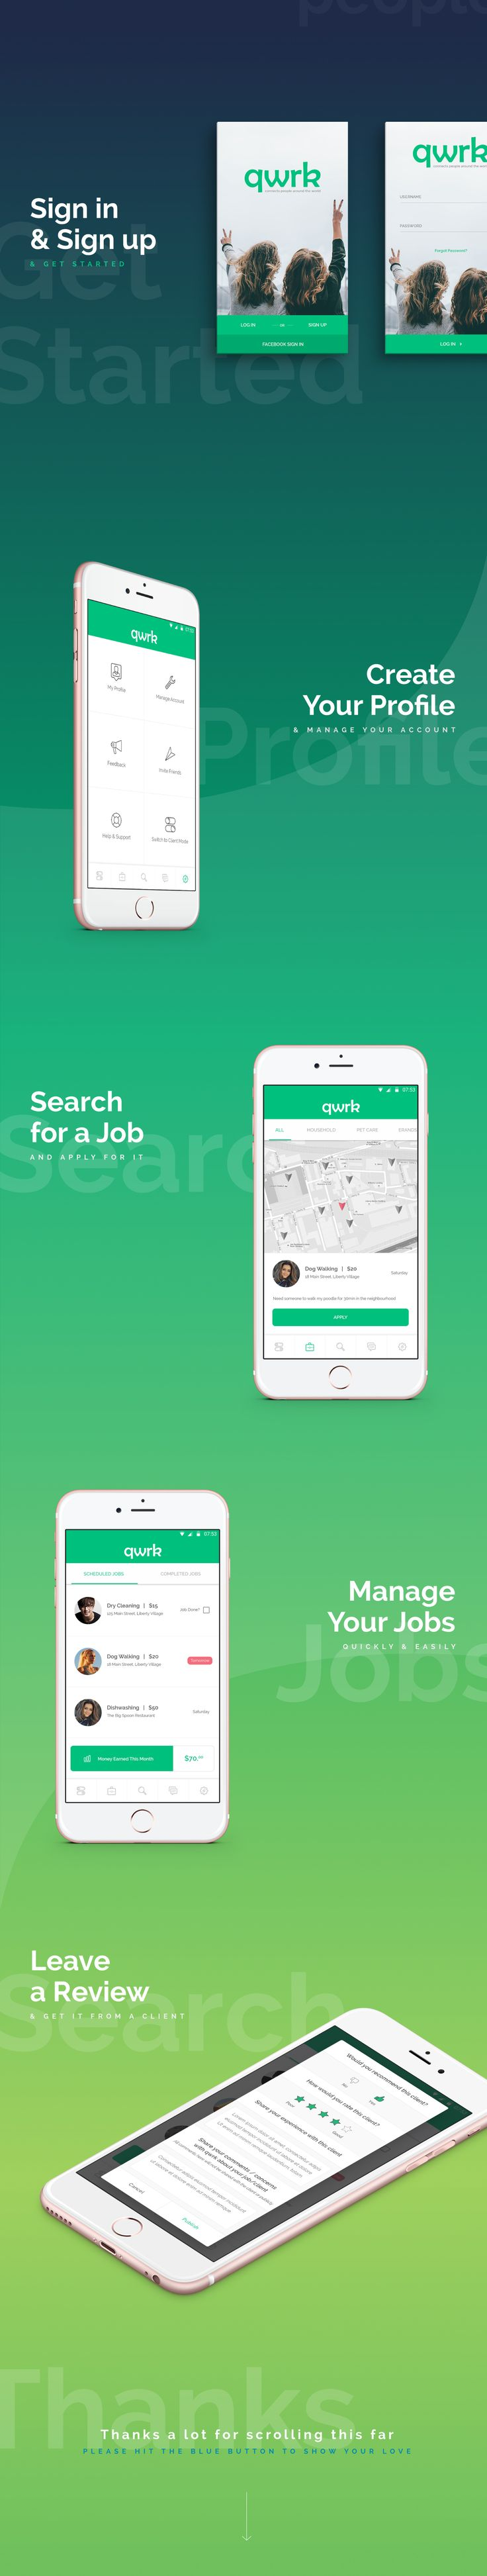 App Design | qwrk on Behance